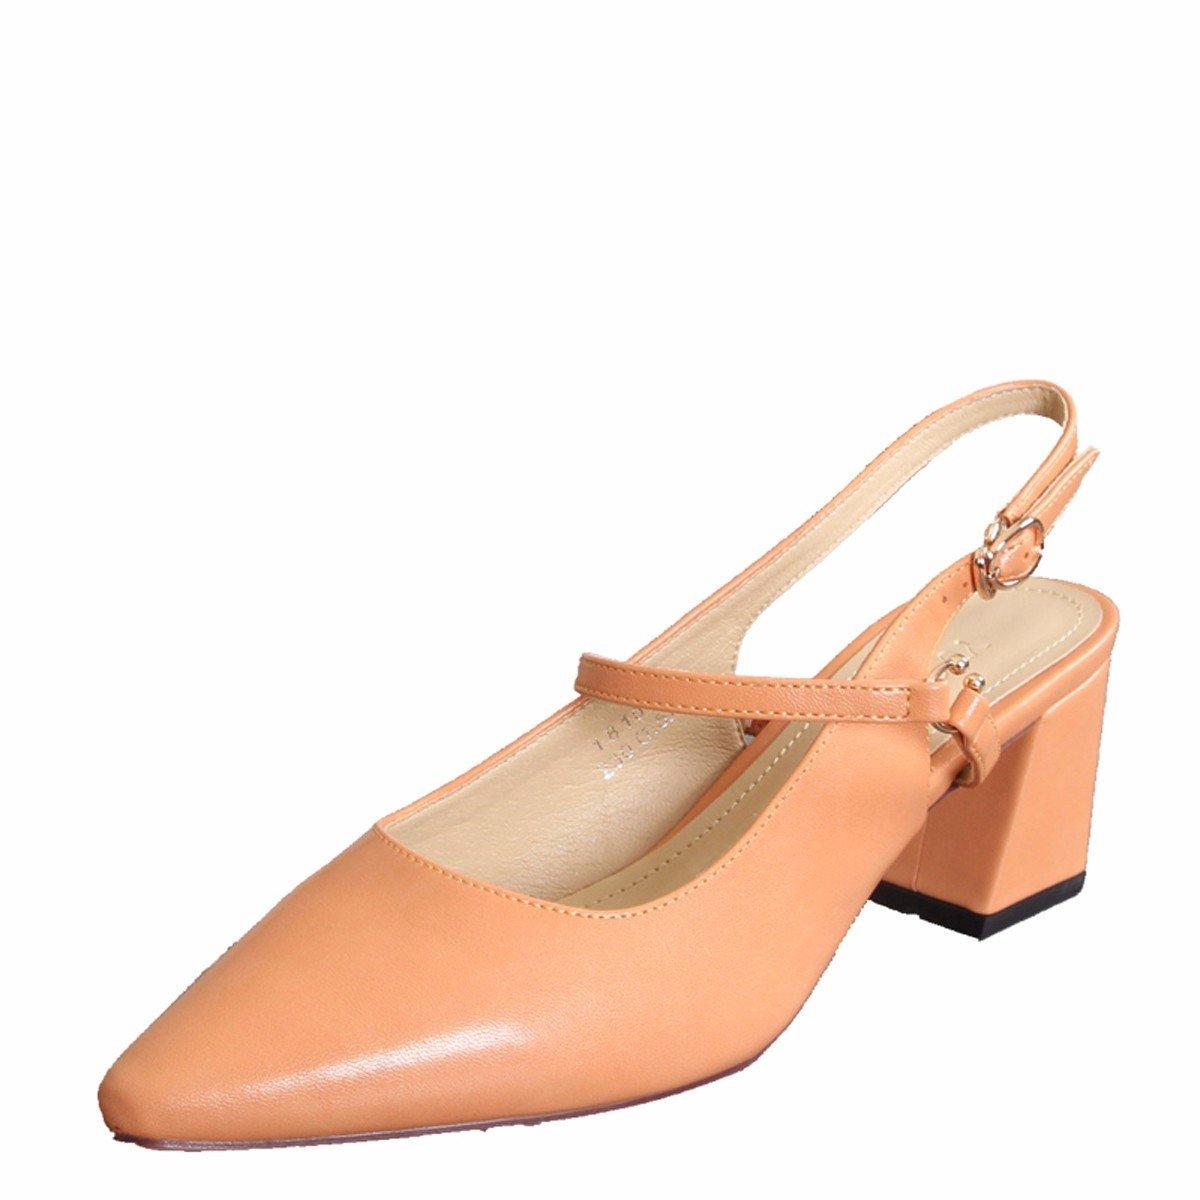 GTVERNH Damenschuhe 7Cm High Sommer Heels Sommer High Wild Leer Schnallen Flache Schuhe Frauen mit Dicken Sandalen. d36713